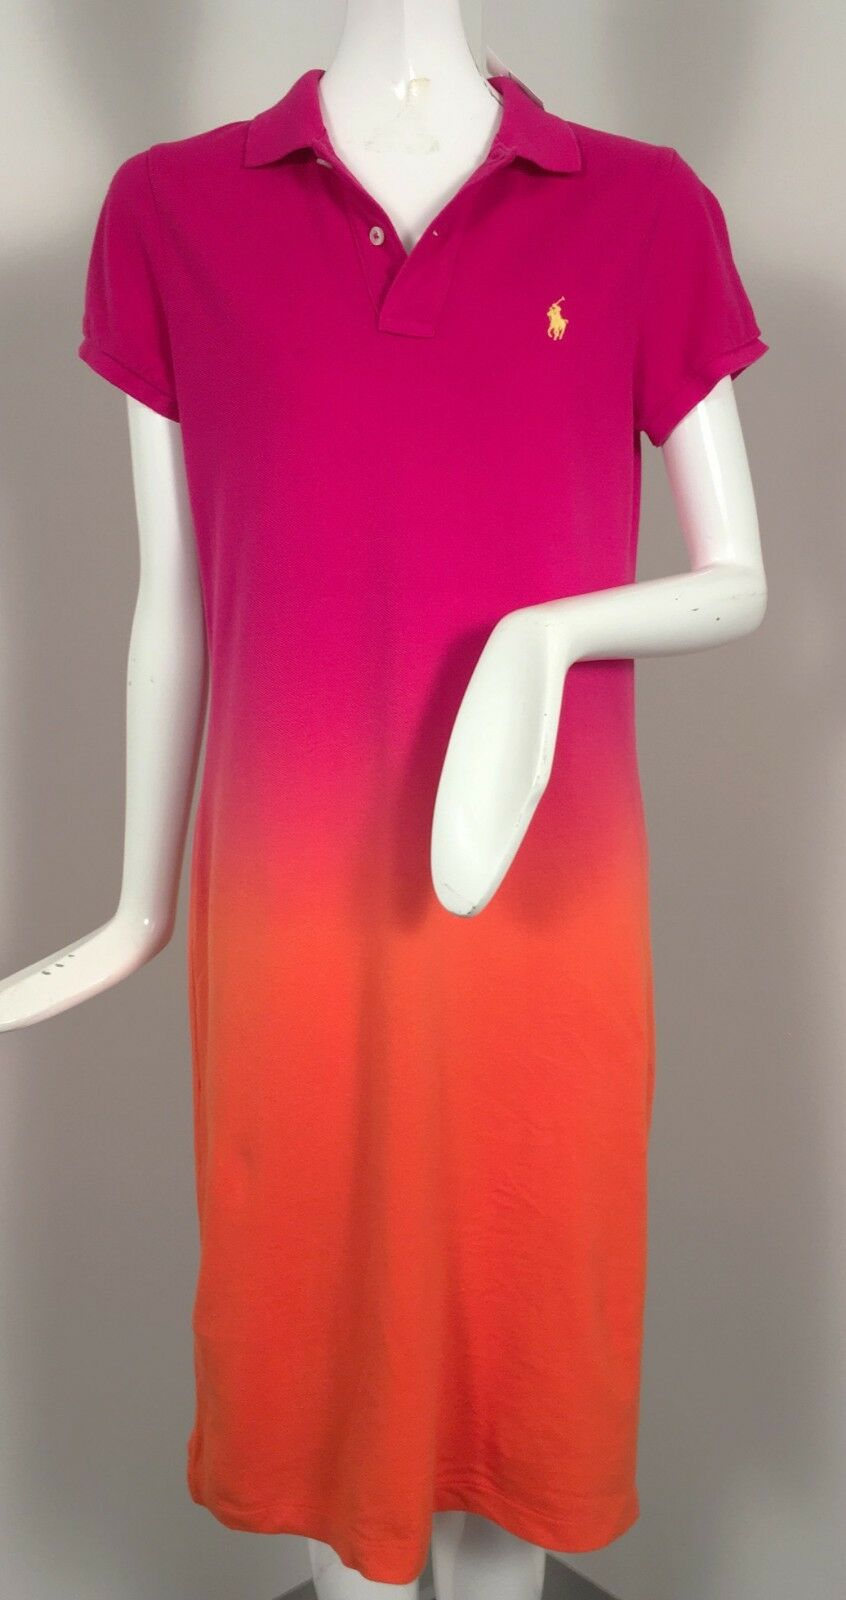 NEW Polo Ralph Lauren Dress   Dip Dye Design  Pink & orange or Yellow & Green